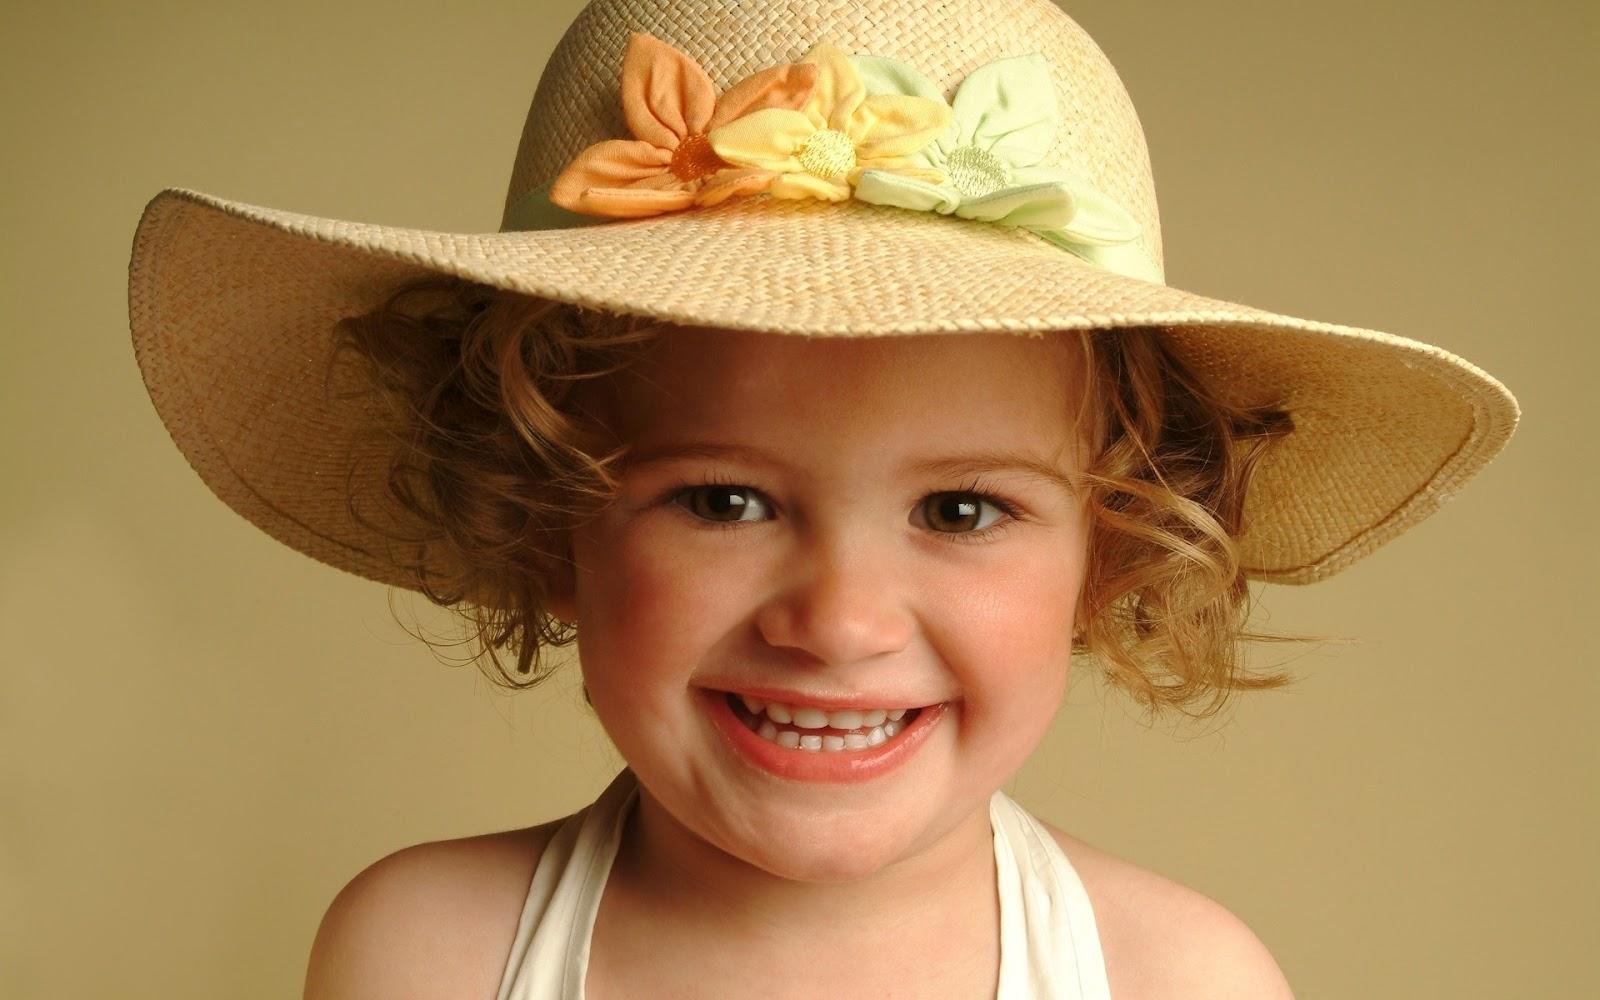 hd bebek resimleri rooteto En Güzel HD Bebek Resimleri